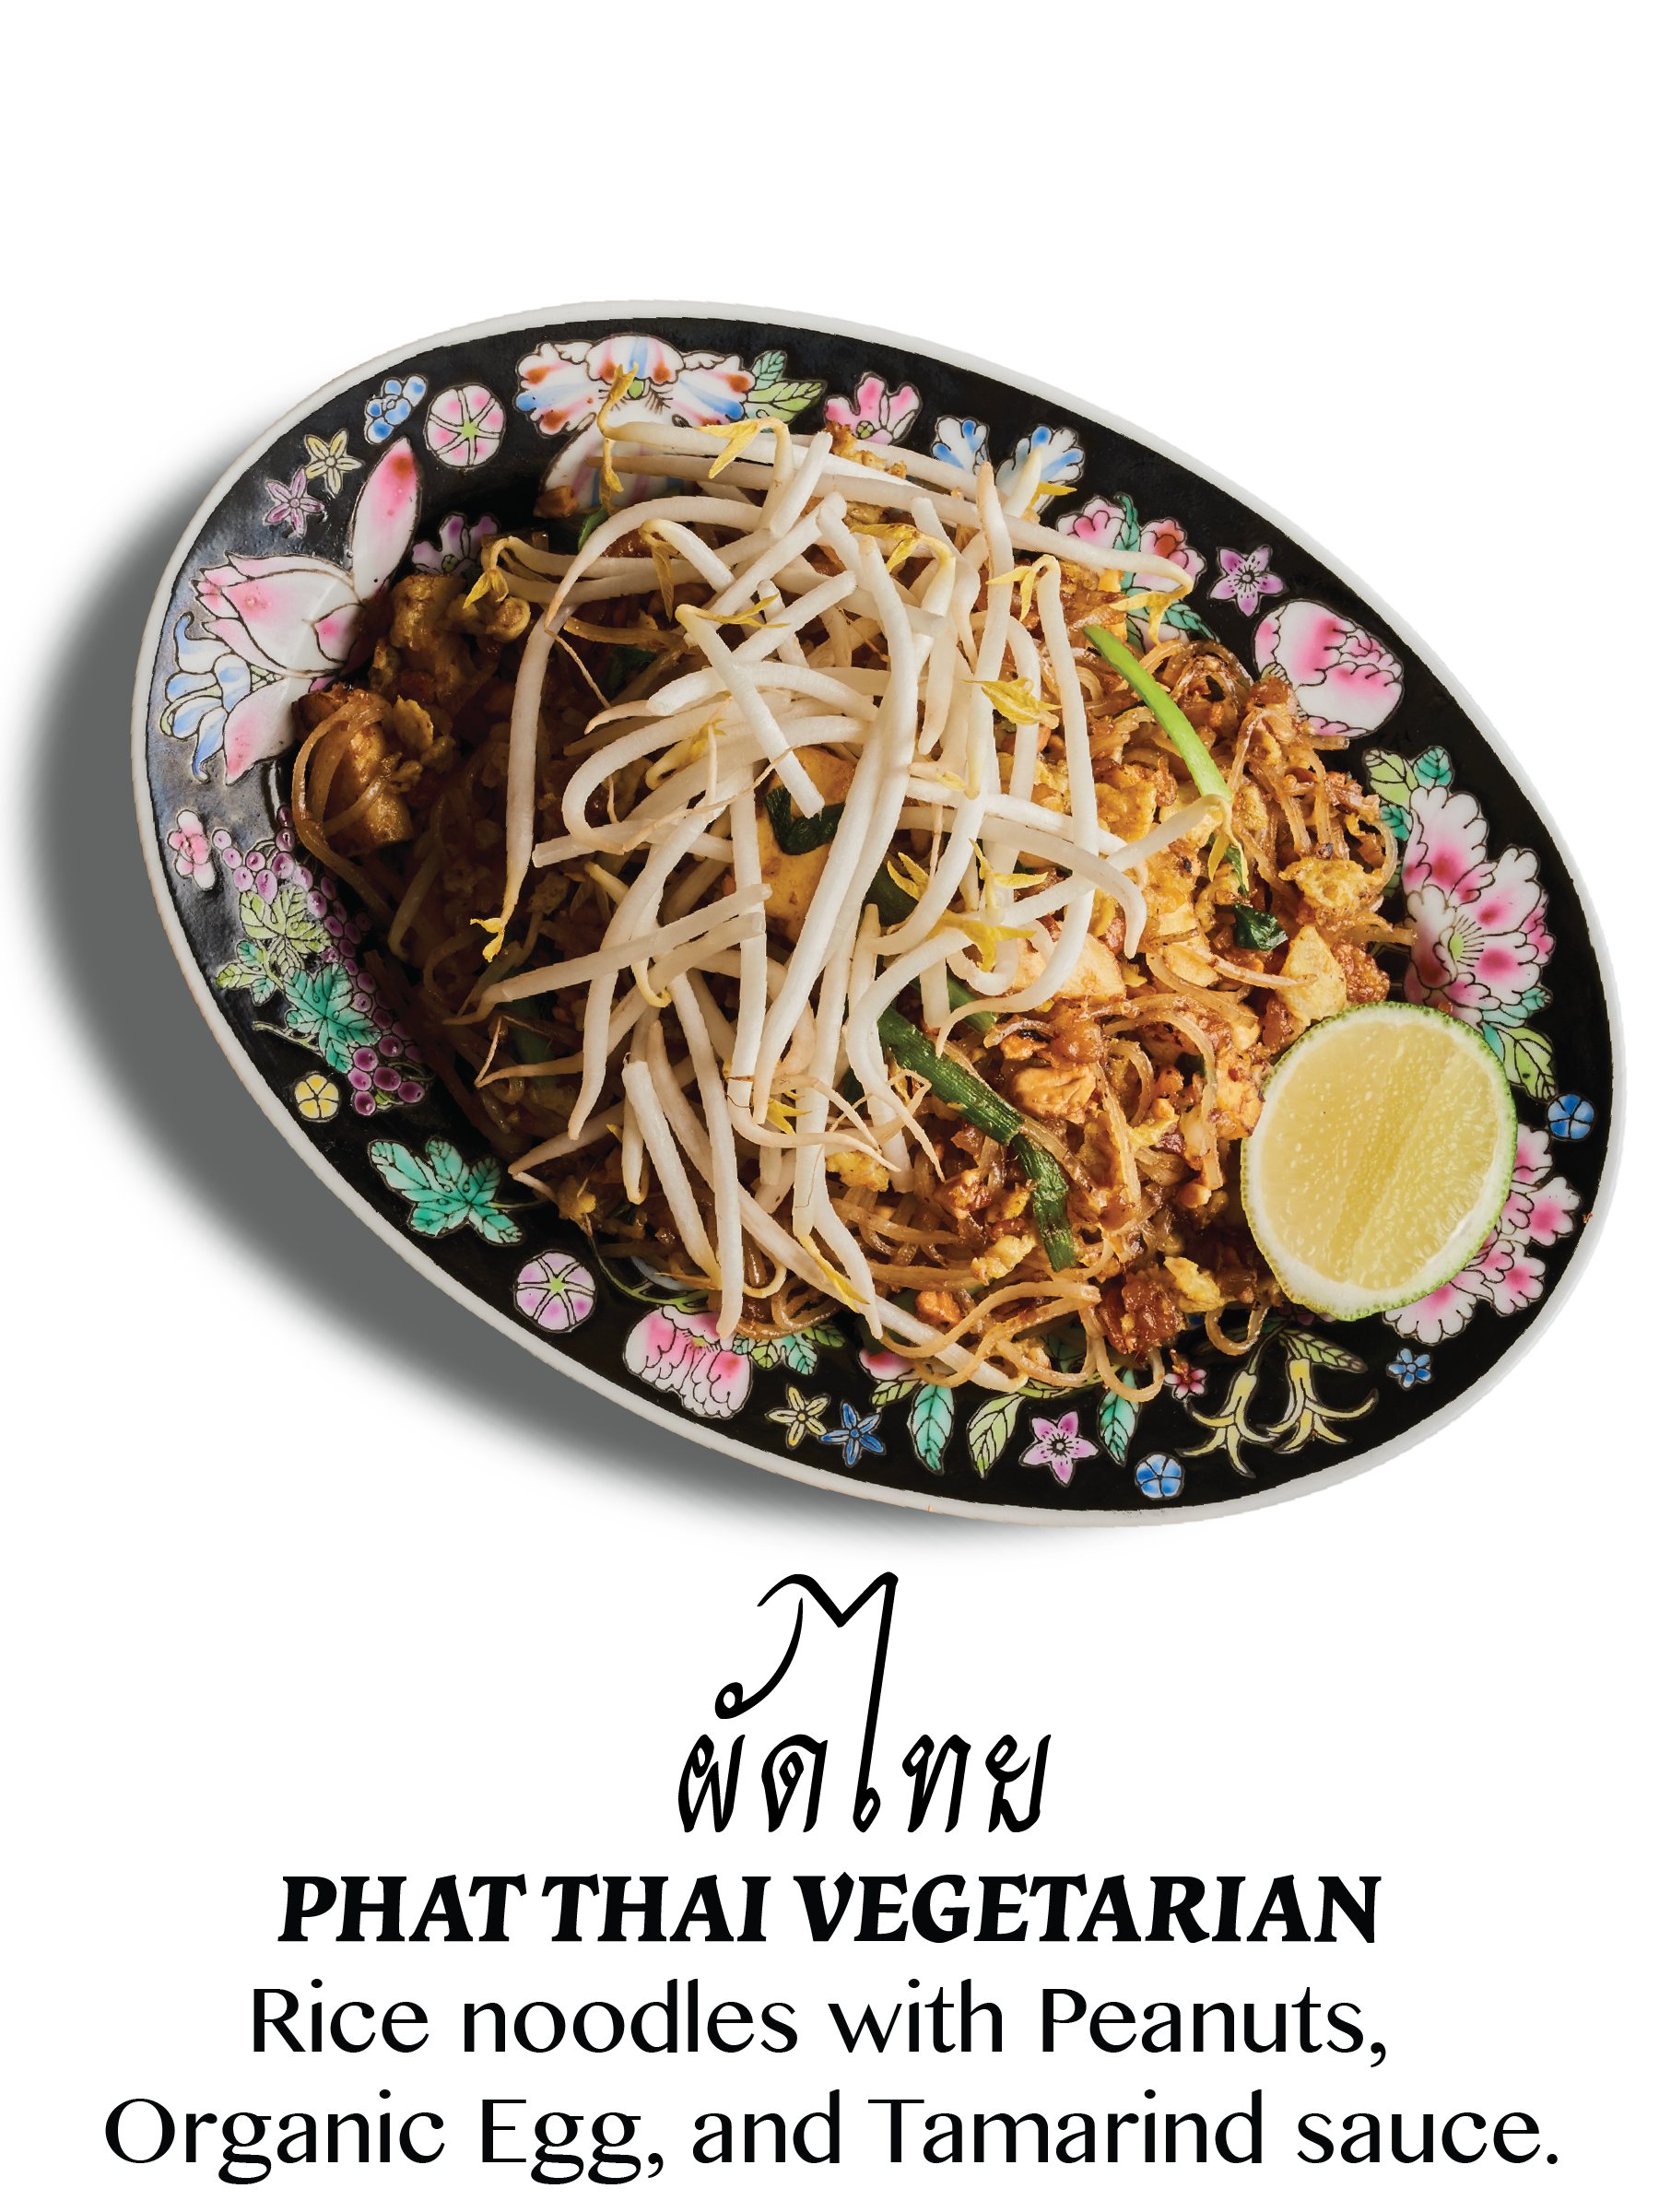 <h2>Phat thai vegetarian<h2>